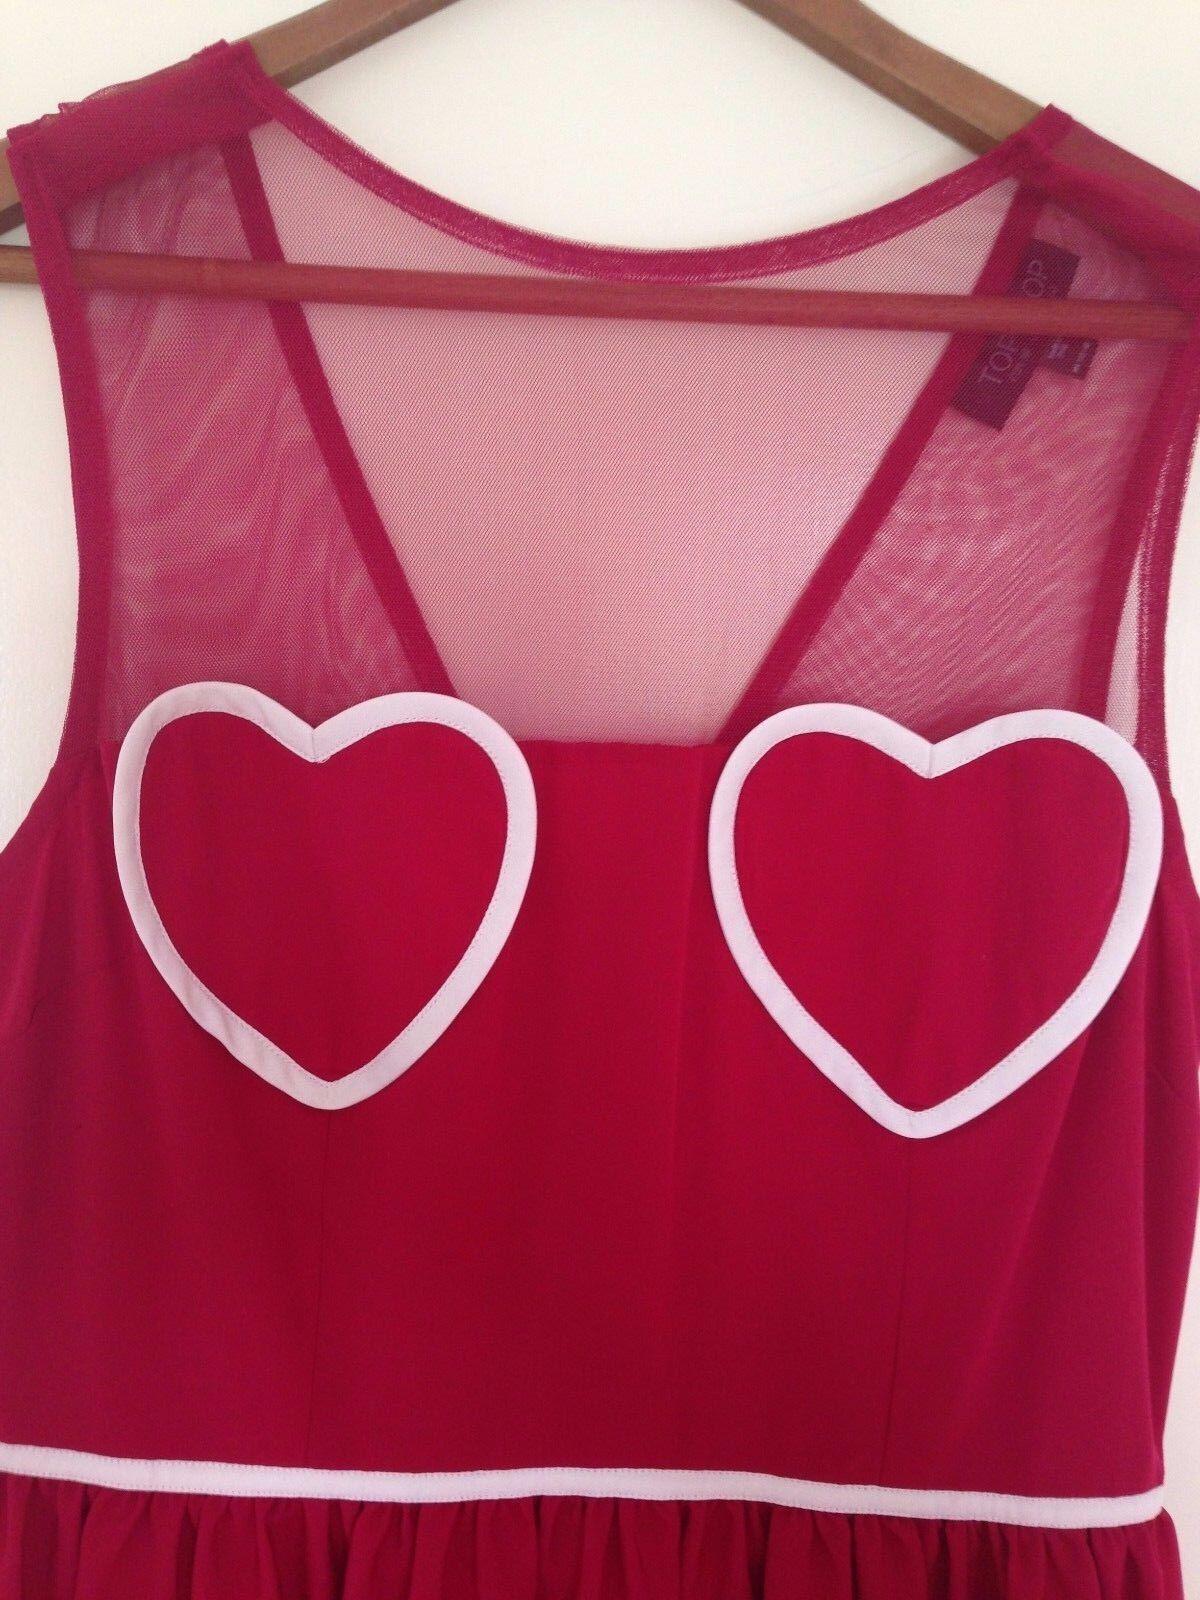 Nouveau Topshop Rosey-Coeur Rouge Maille Flippy Summer Skater tea party party party dress UK 10 b2284c